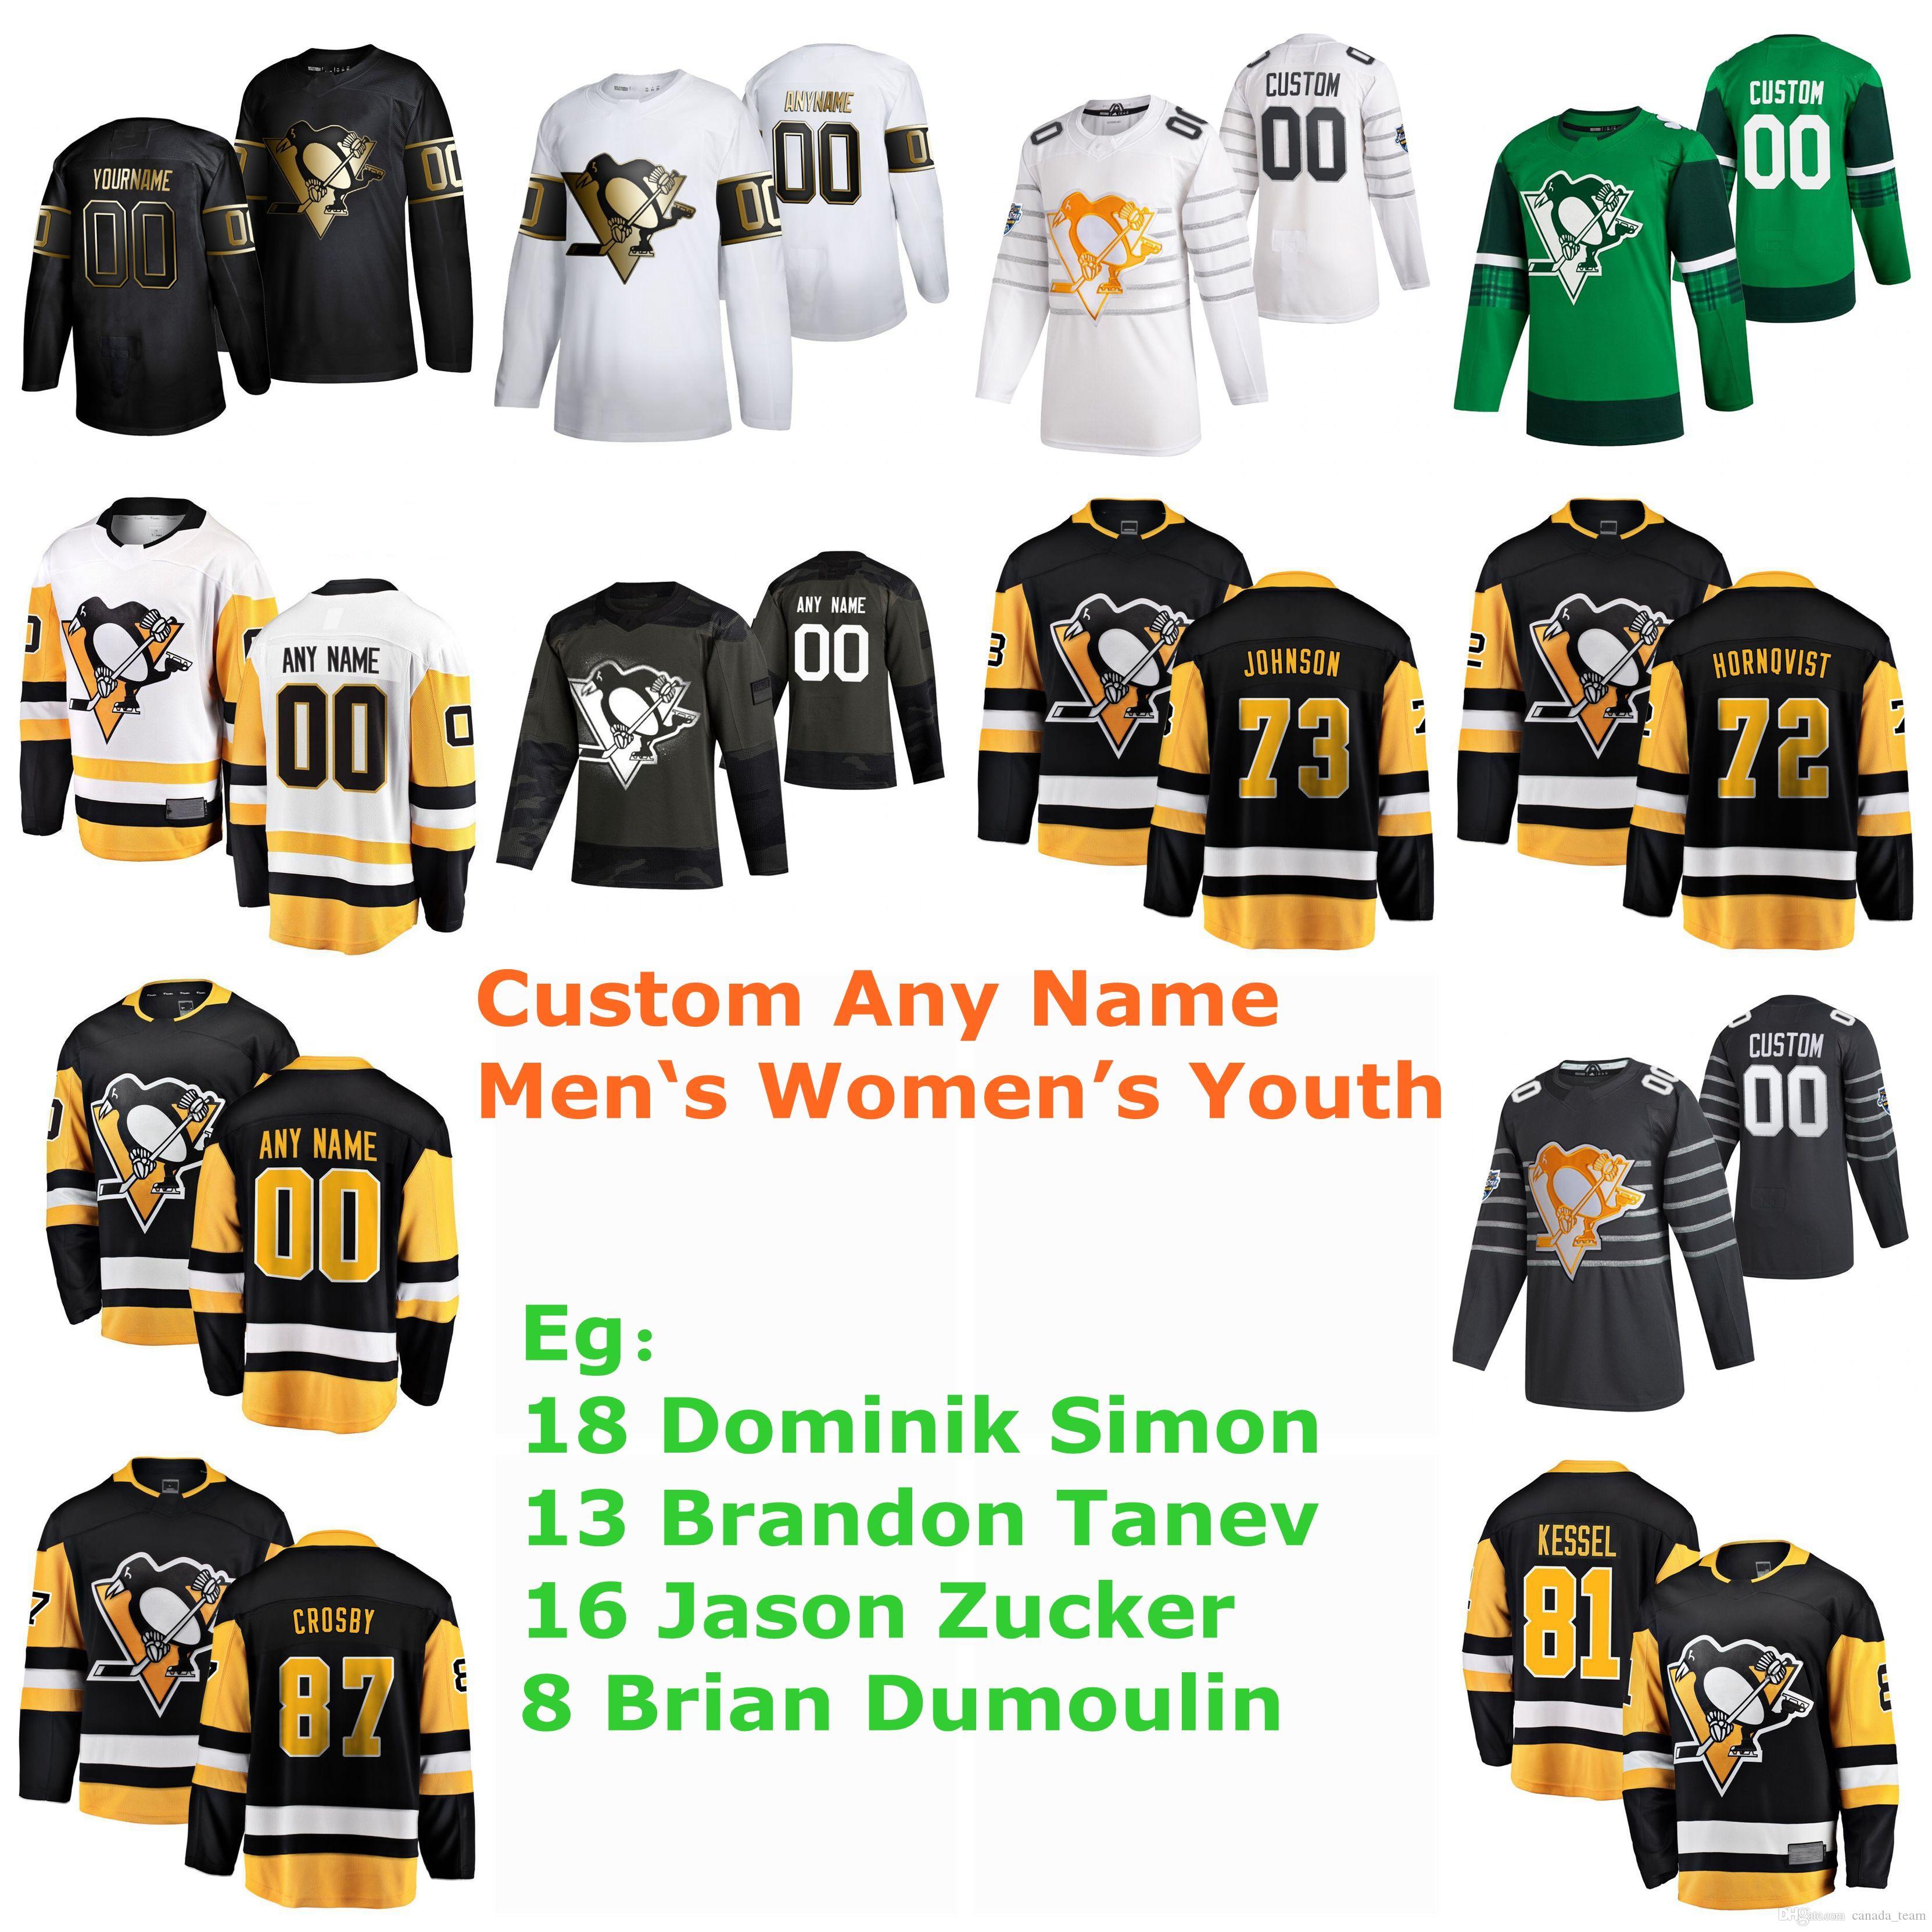 S-6XL Pittsburgh Penguins 2020 All-Star Hockey Jerseys 18 Dominik Simon Jersey 13 Brandon Tanev Jason Zucker Brian Dumoulin personalizado costurado